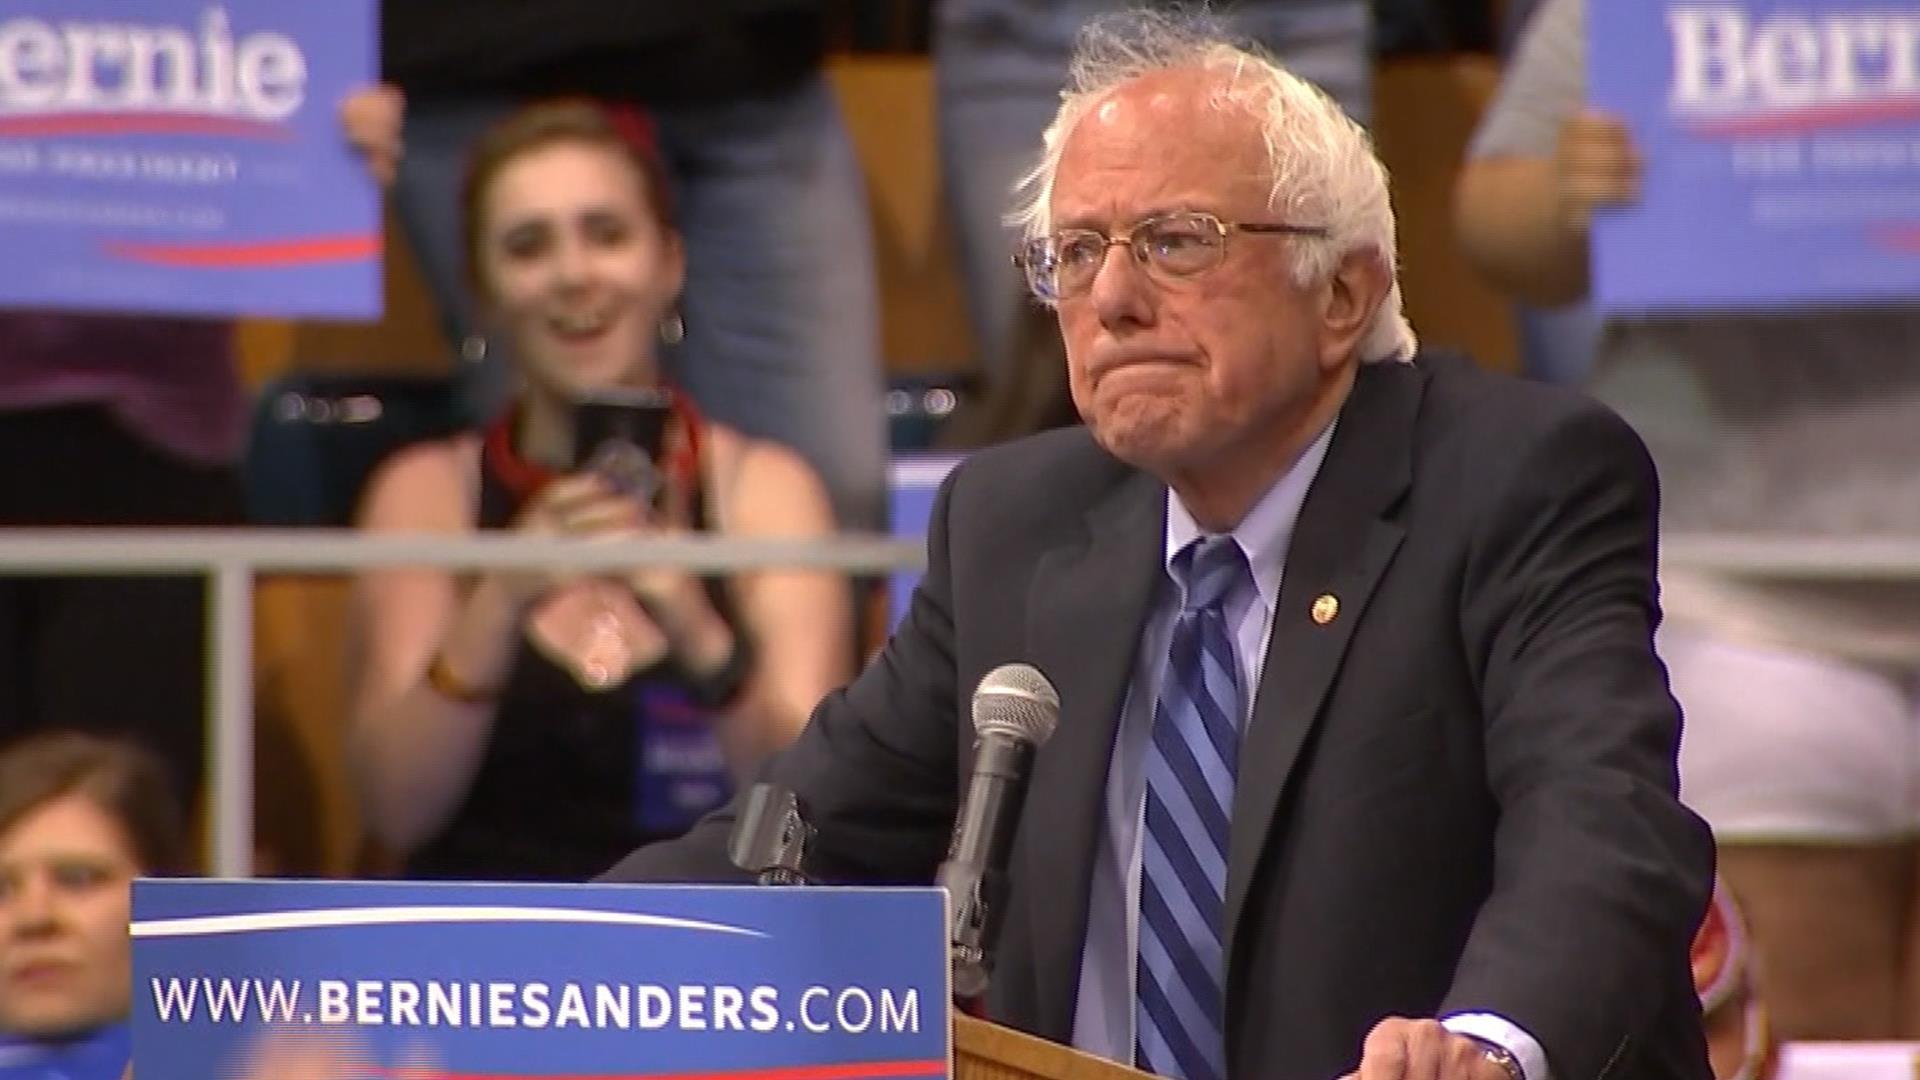 Bernie Sanders Wins West Virginia's Democratic Primary